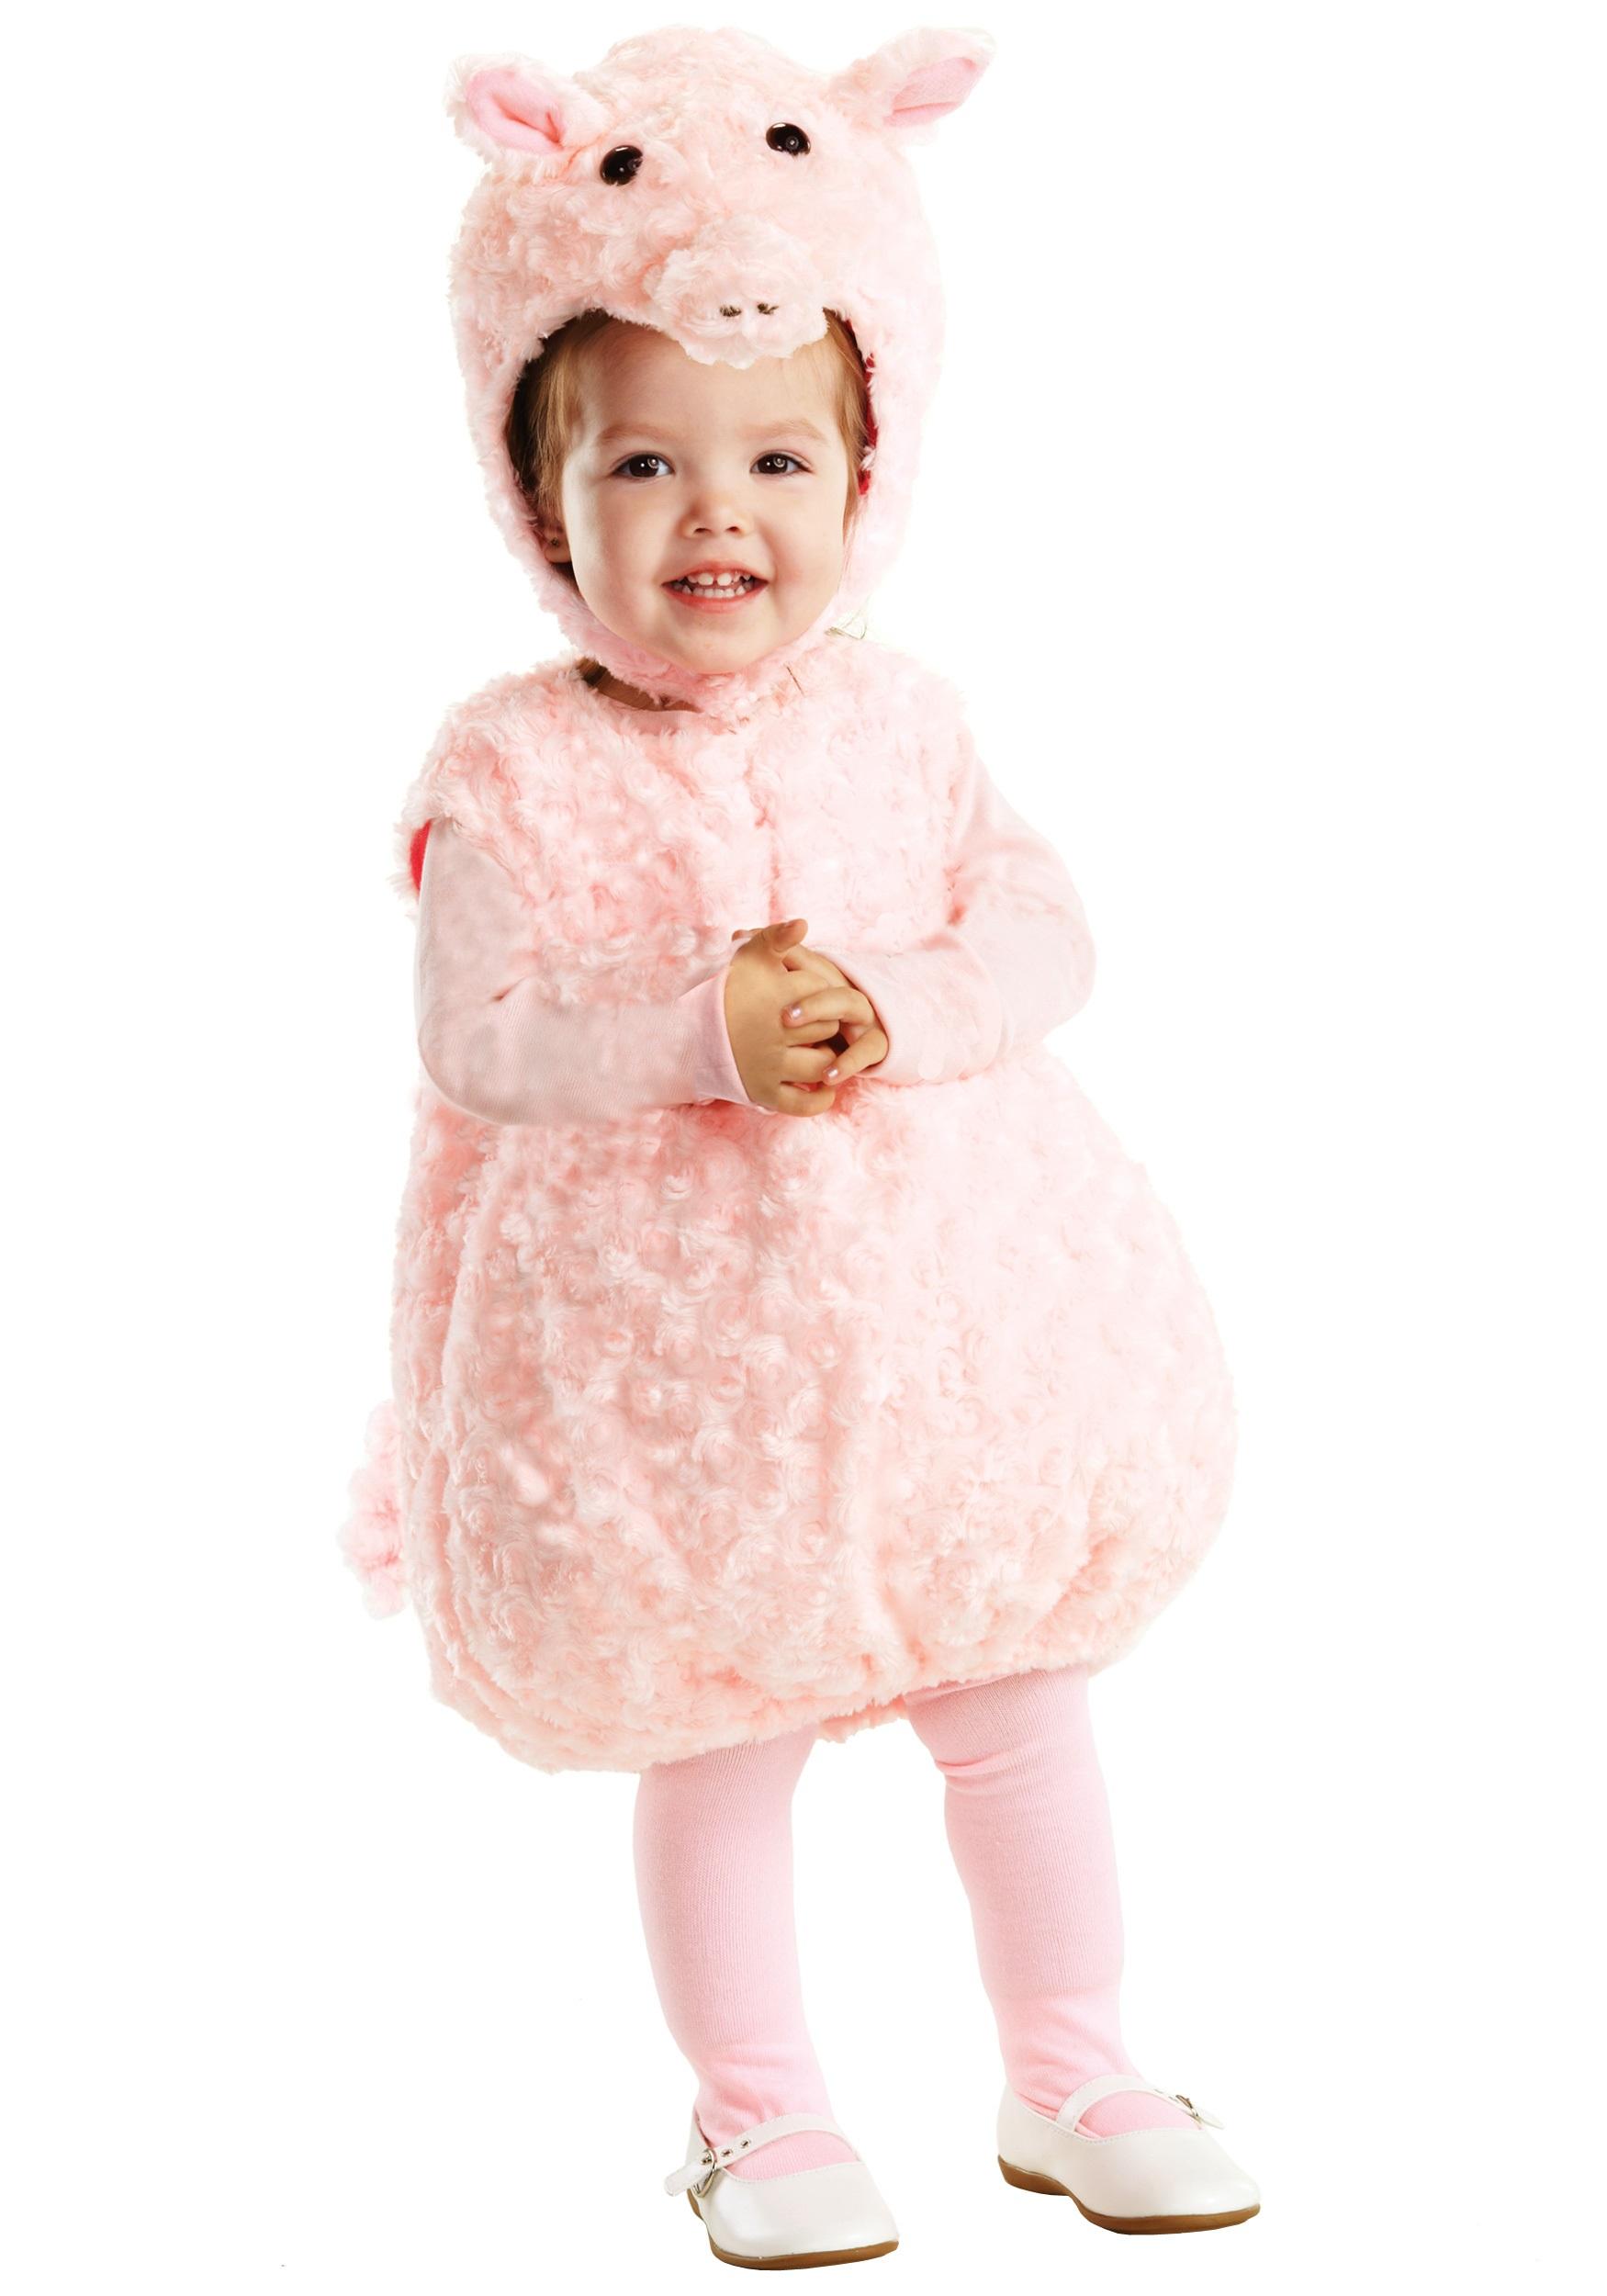 10 Wonderful Baby Costume Ideas For Girls pink piglet toddler farm costume child pig animal costume ideas 2021